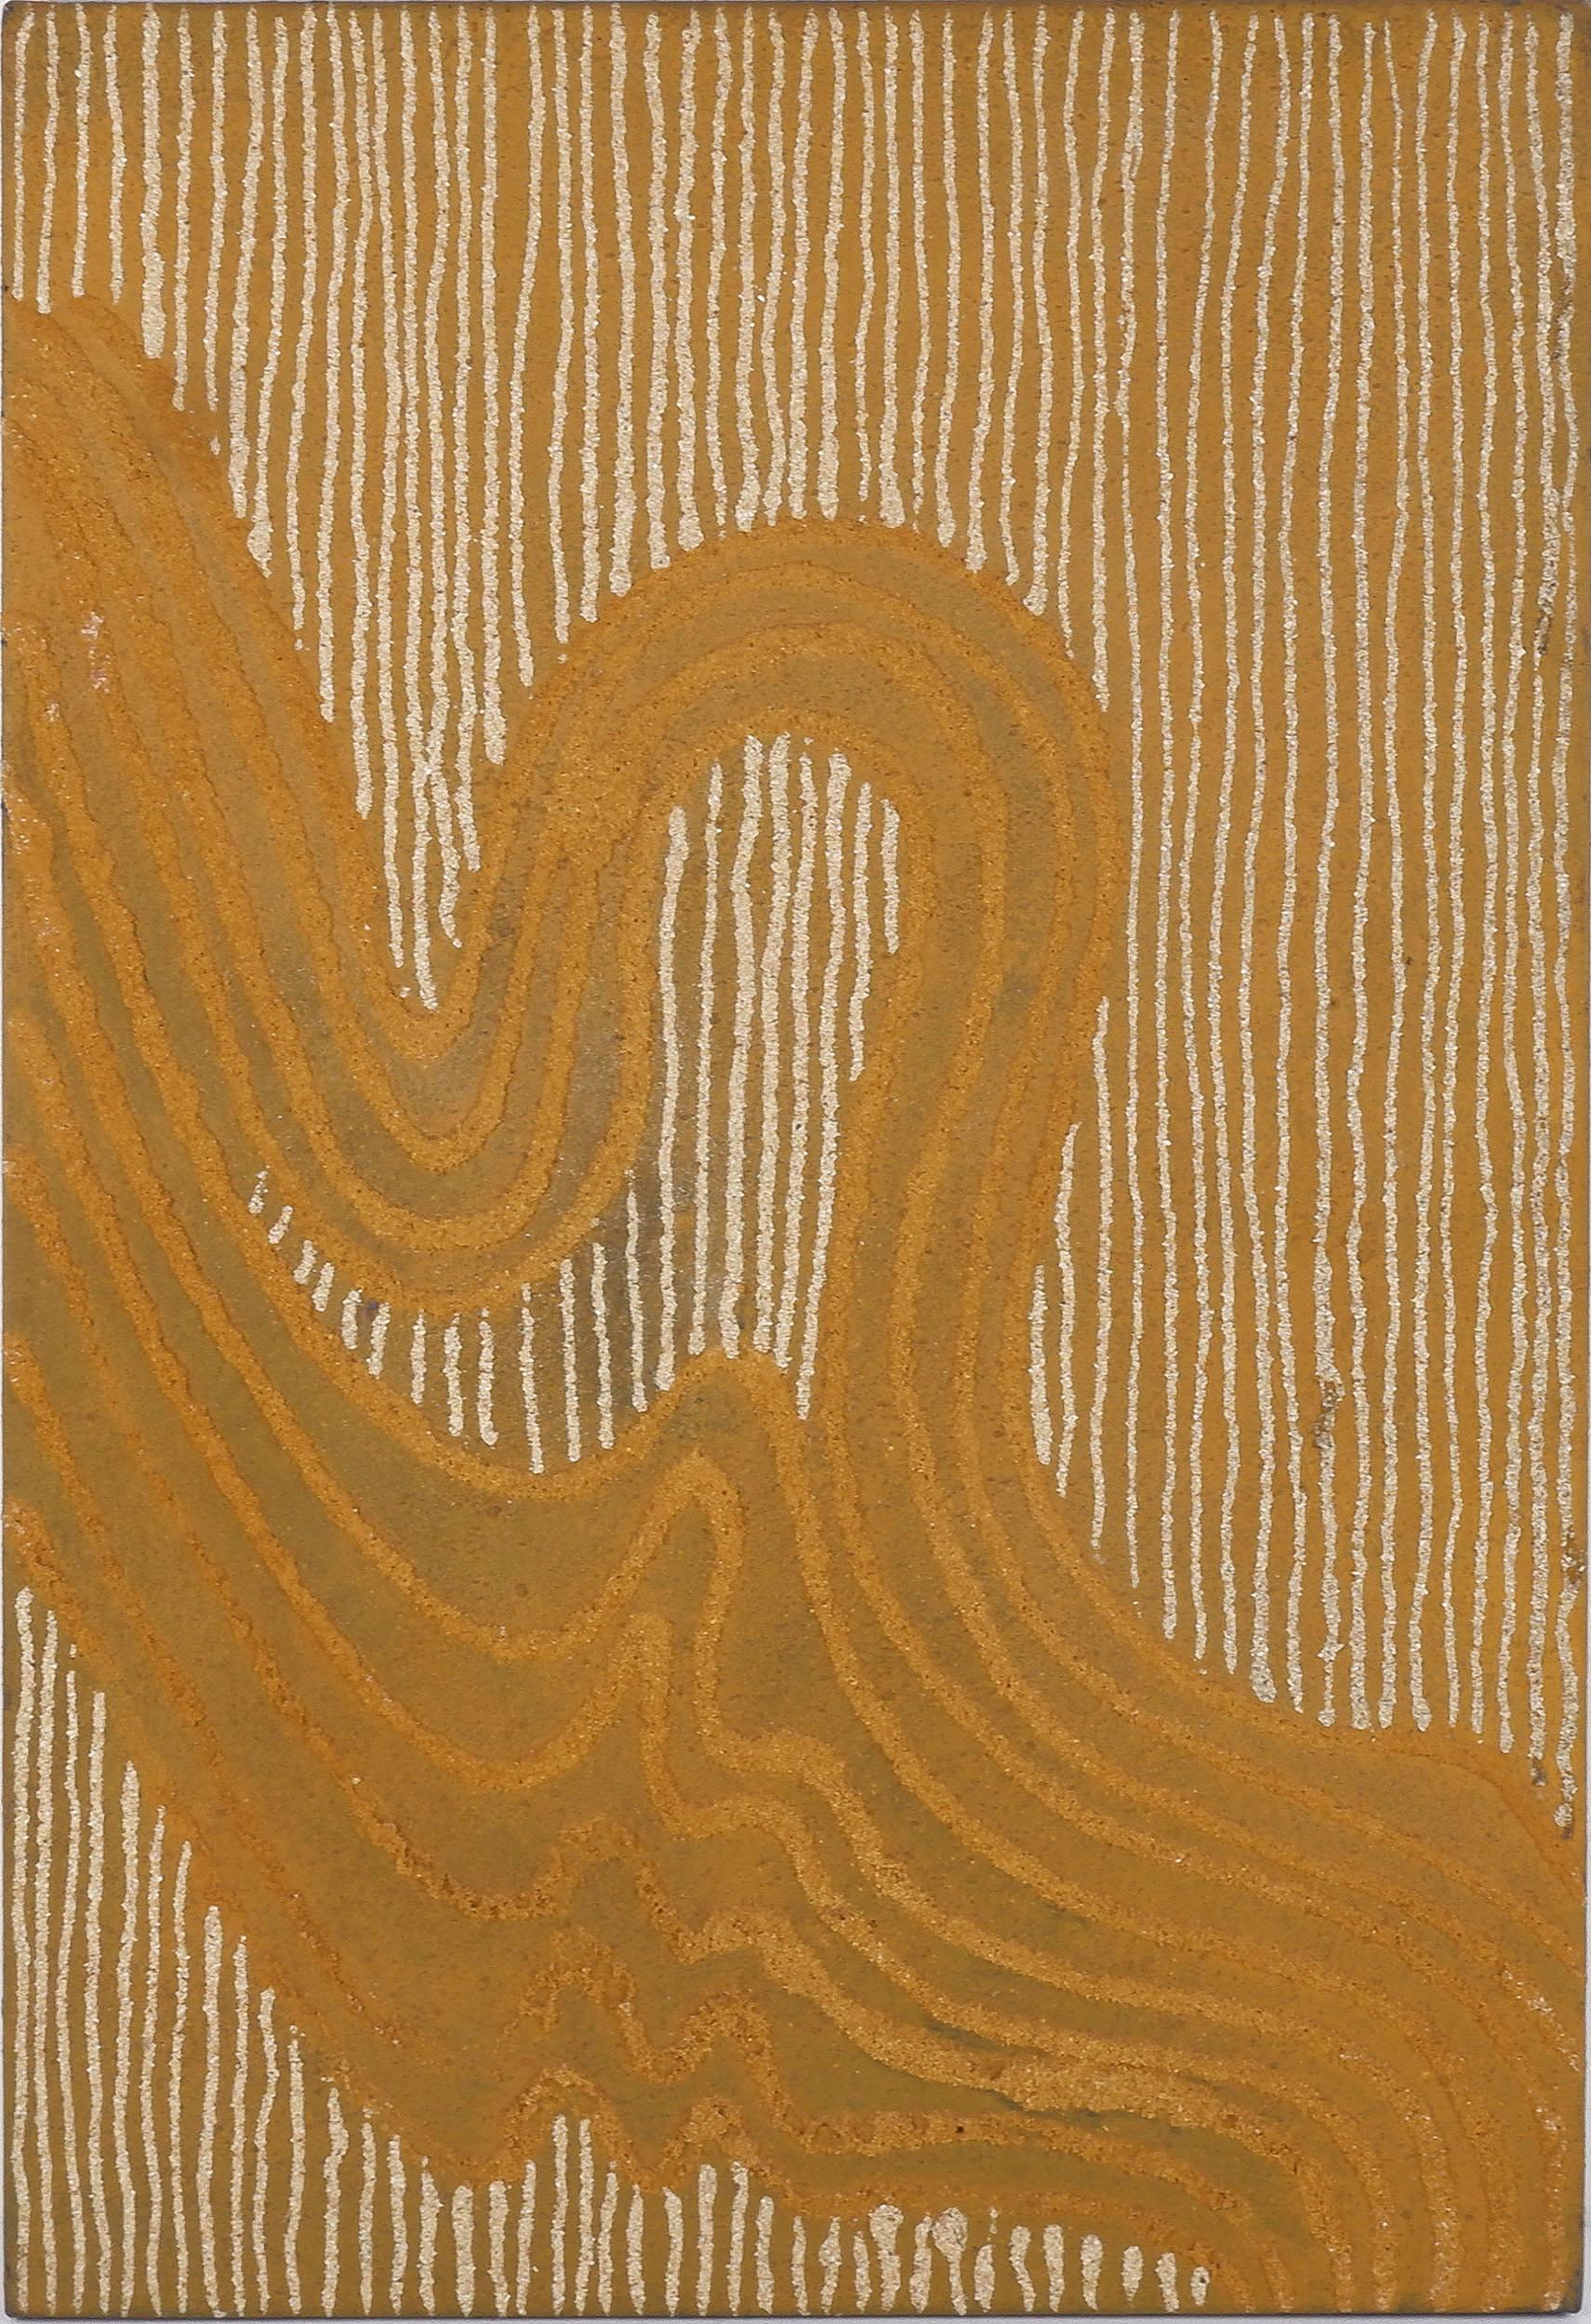 'Jonathan Kumintjarra Brown (1960-1997) Sandhills At Ooldea - Johns Grandfathers Country 1997, Sand and Acrylic on Linen'